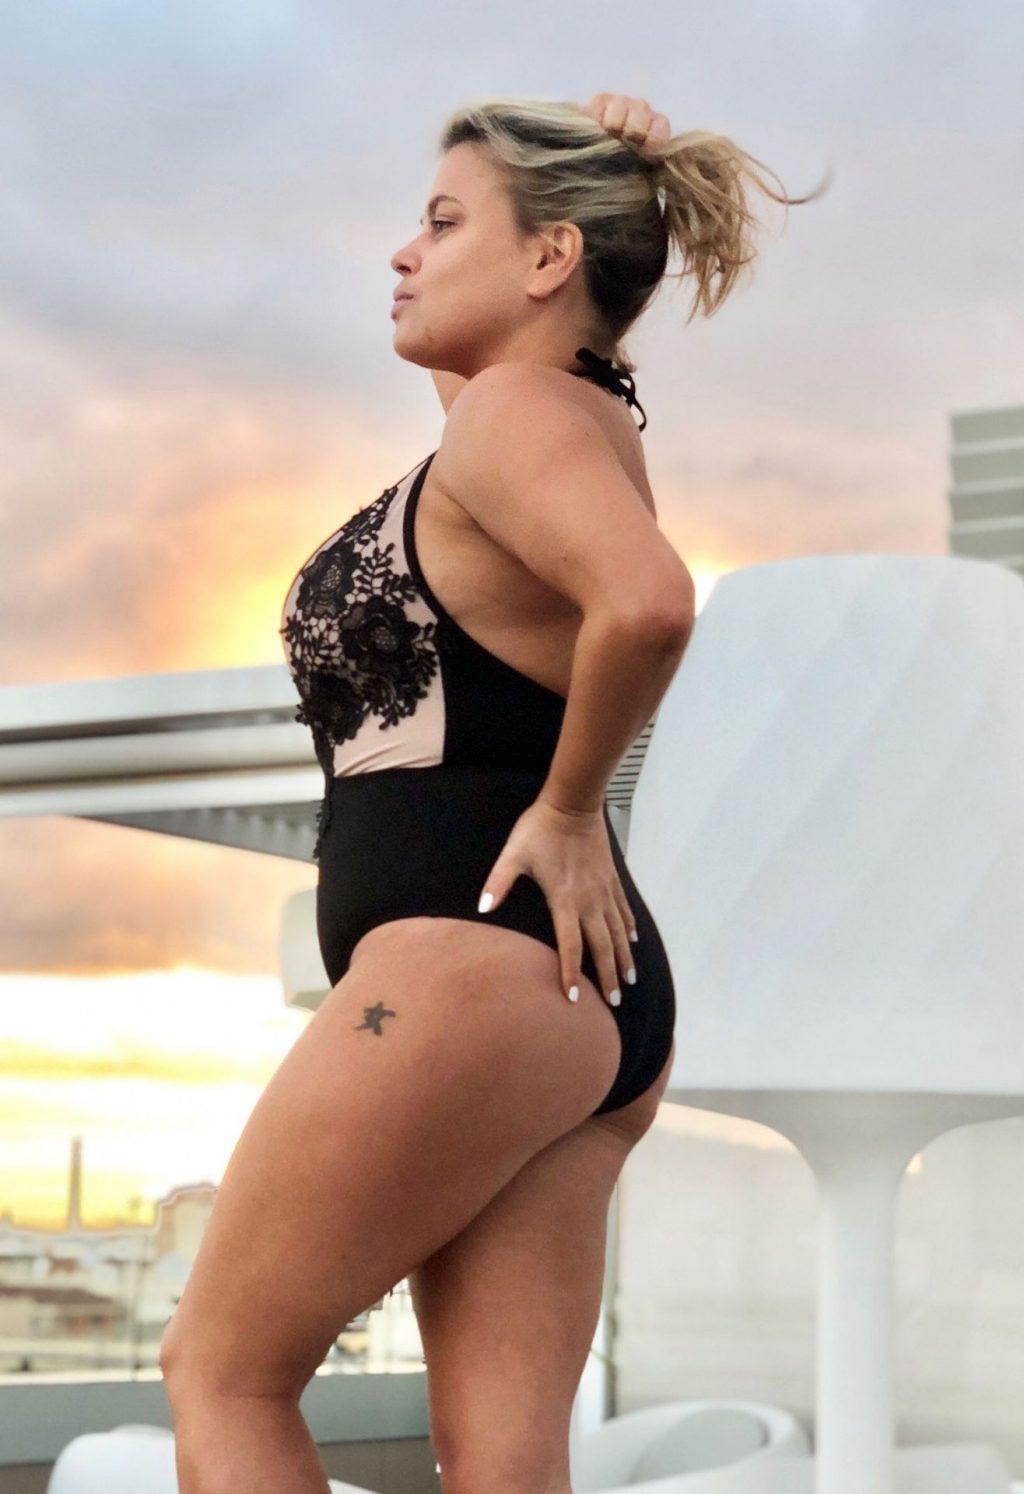 Anastasija Budic naked pics. 2018-2019 celebrityes photos leaks! naked (12 photos), Paparazzi Celebrites photo